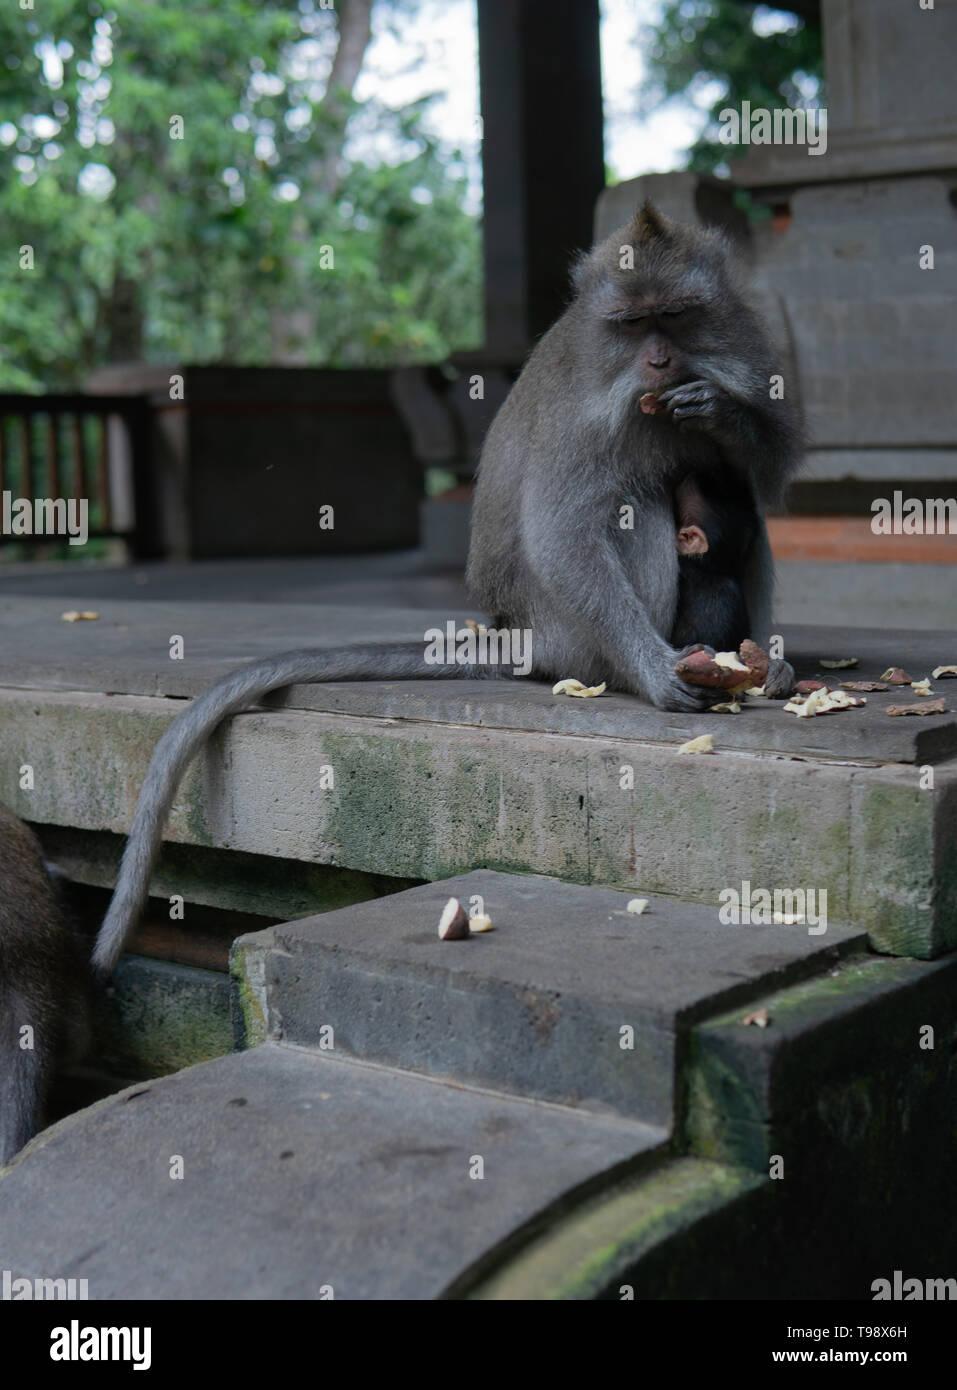 Mother and baby monkey sit together at Monkey Forrest, Ubud, Bali, Indonesia. - Stock Image